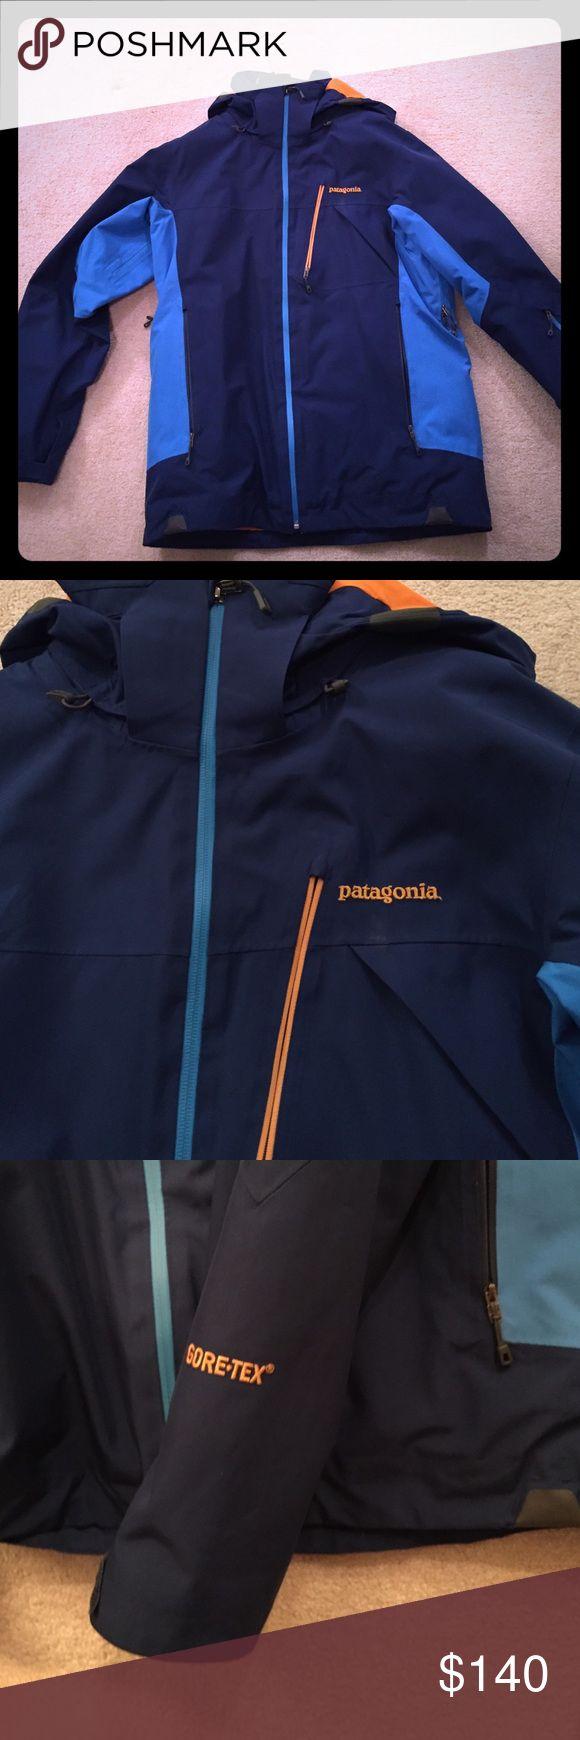 Patagonia Ski Jacket Patagonia ski jacket that is lined; removable hood; goretex Patagonia Jackets & Coats Utility Jackets